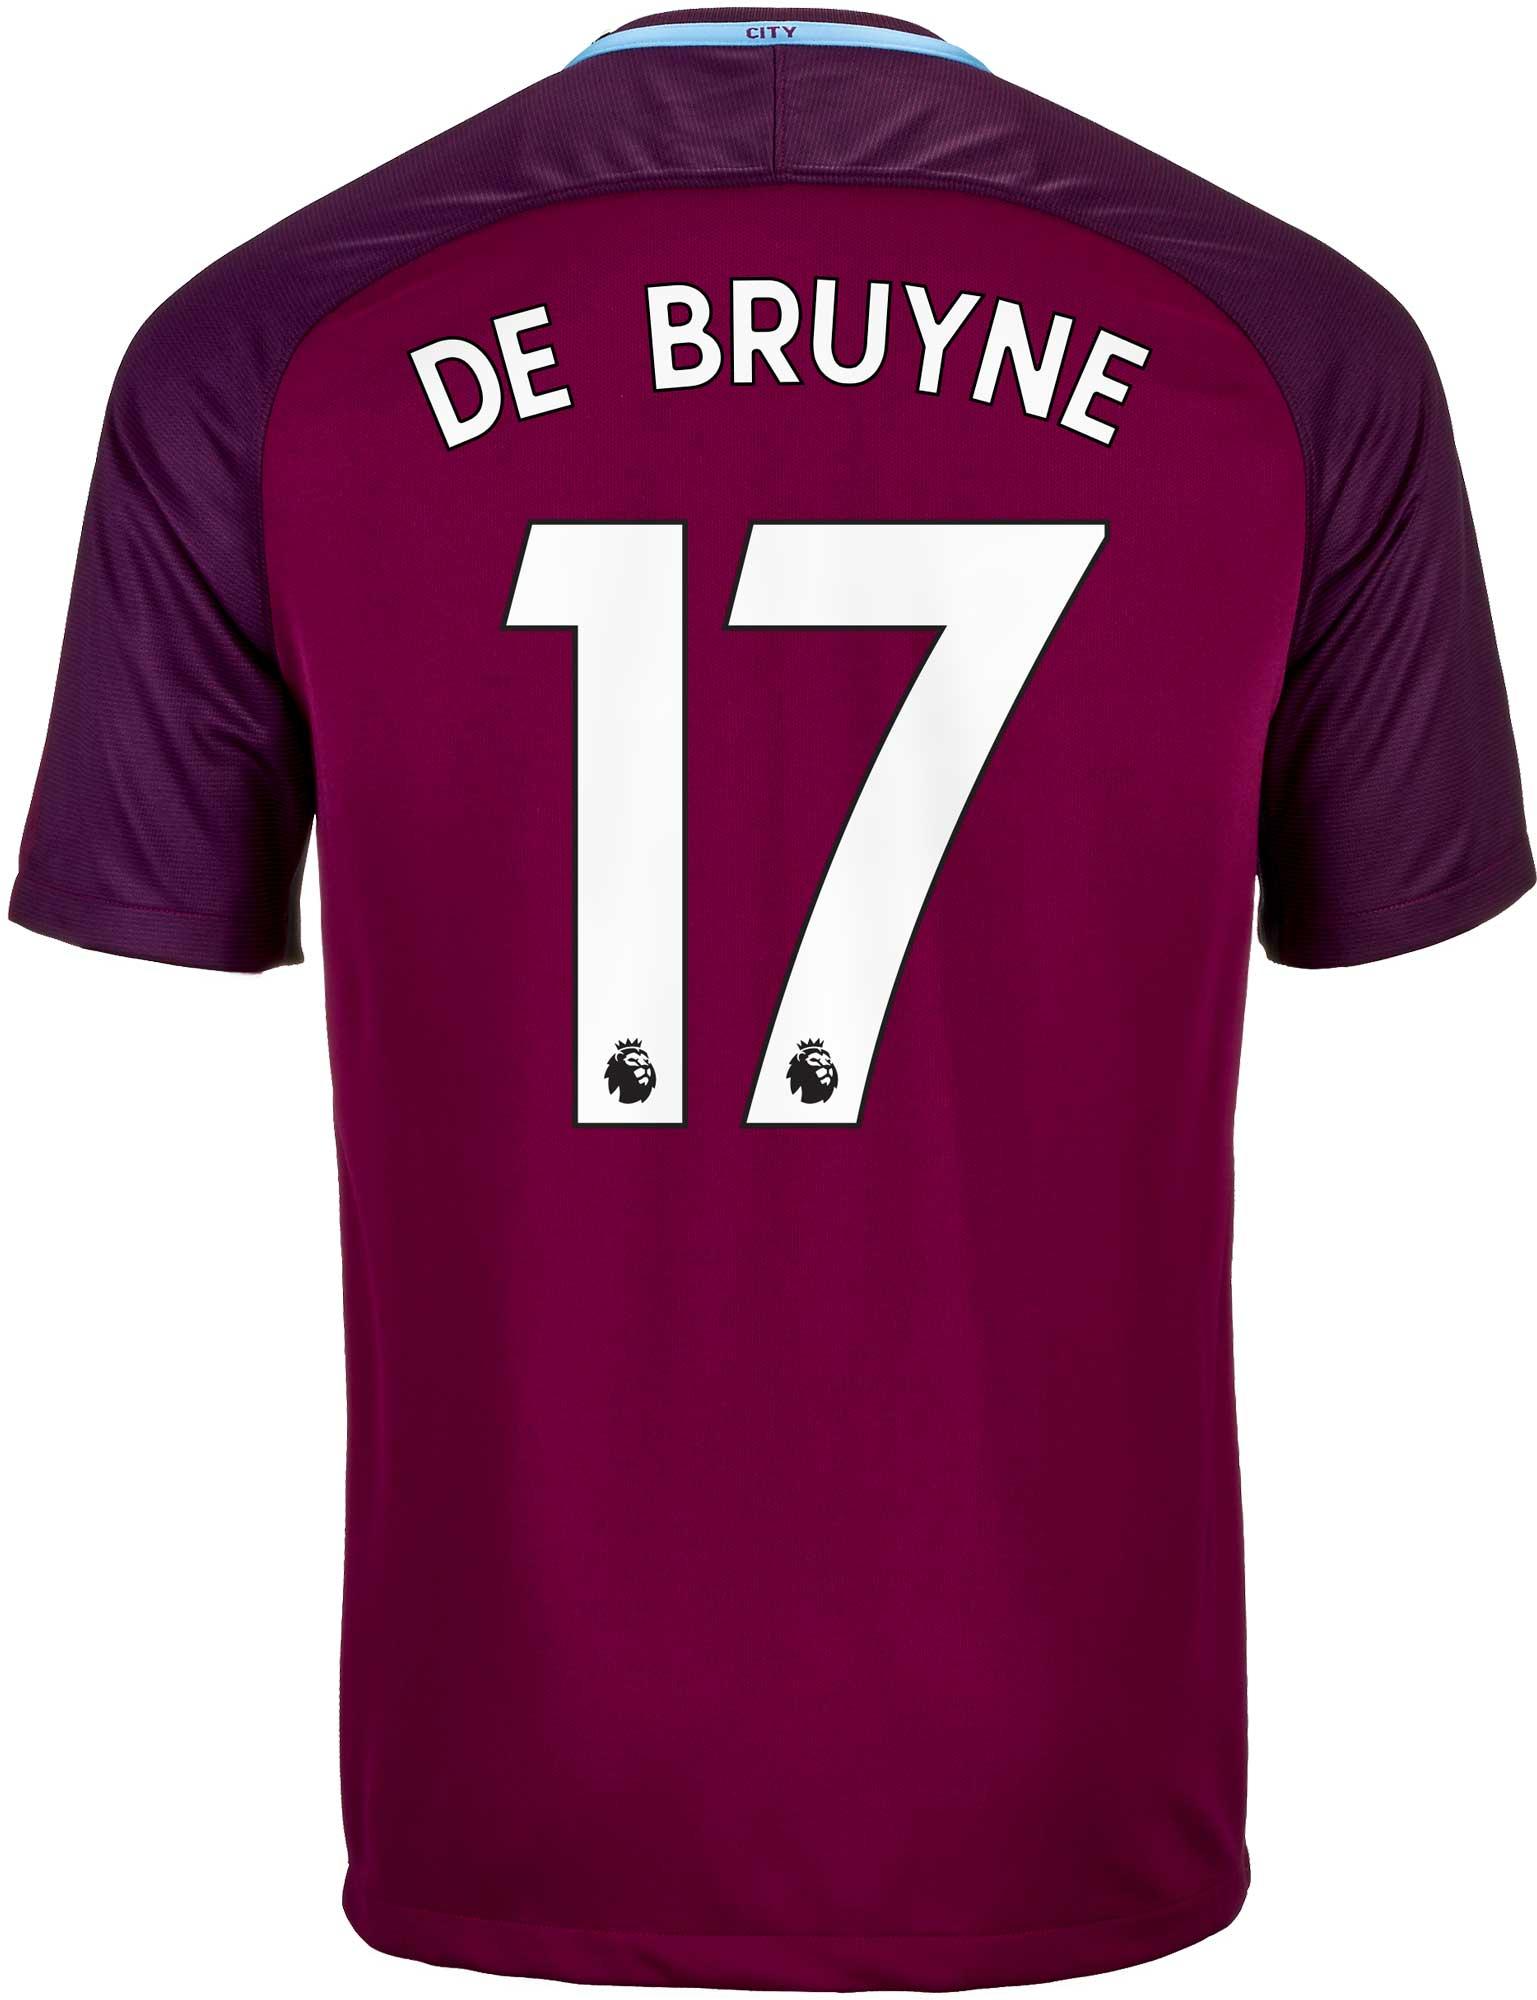 b71bc6374d8 Nike Kevin De Bruyne Manchester City Away Jersey 2017-18 - SoccerPro